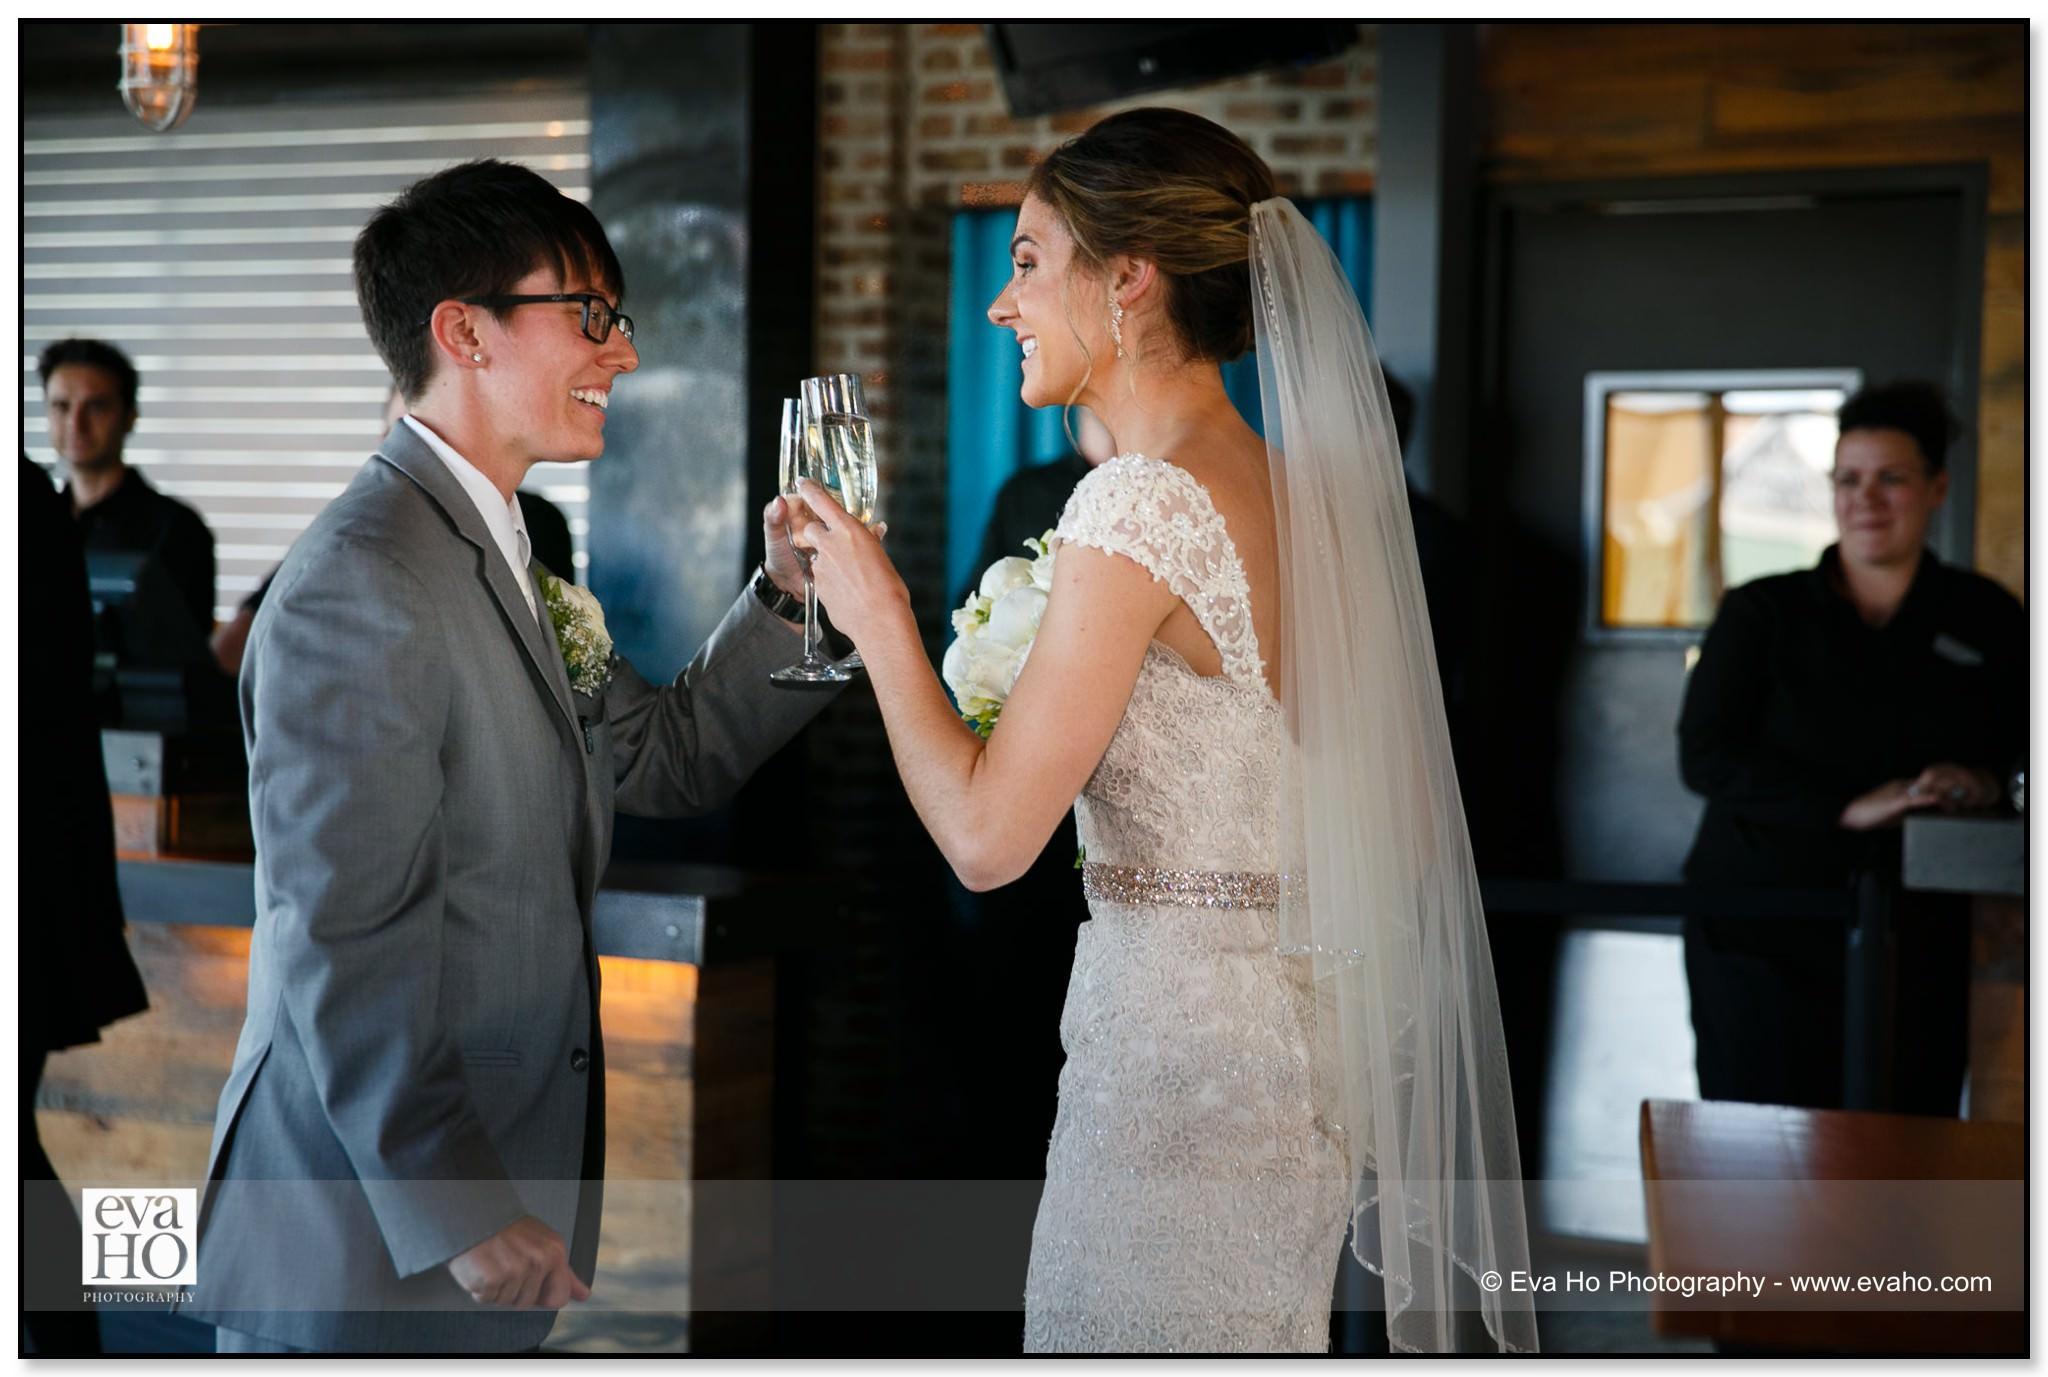 Brides toast